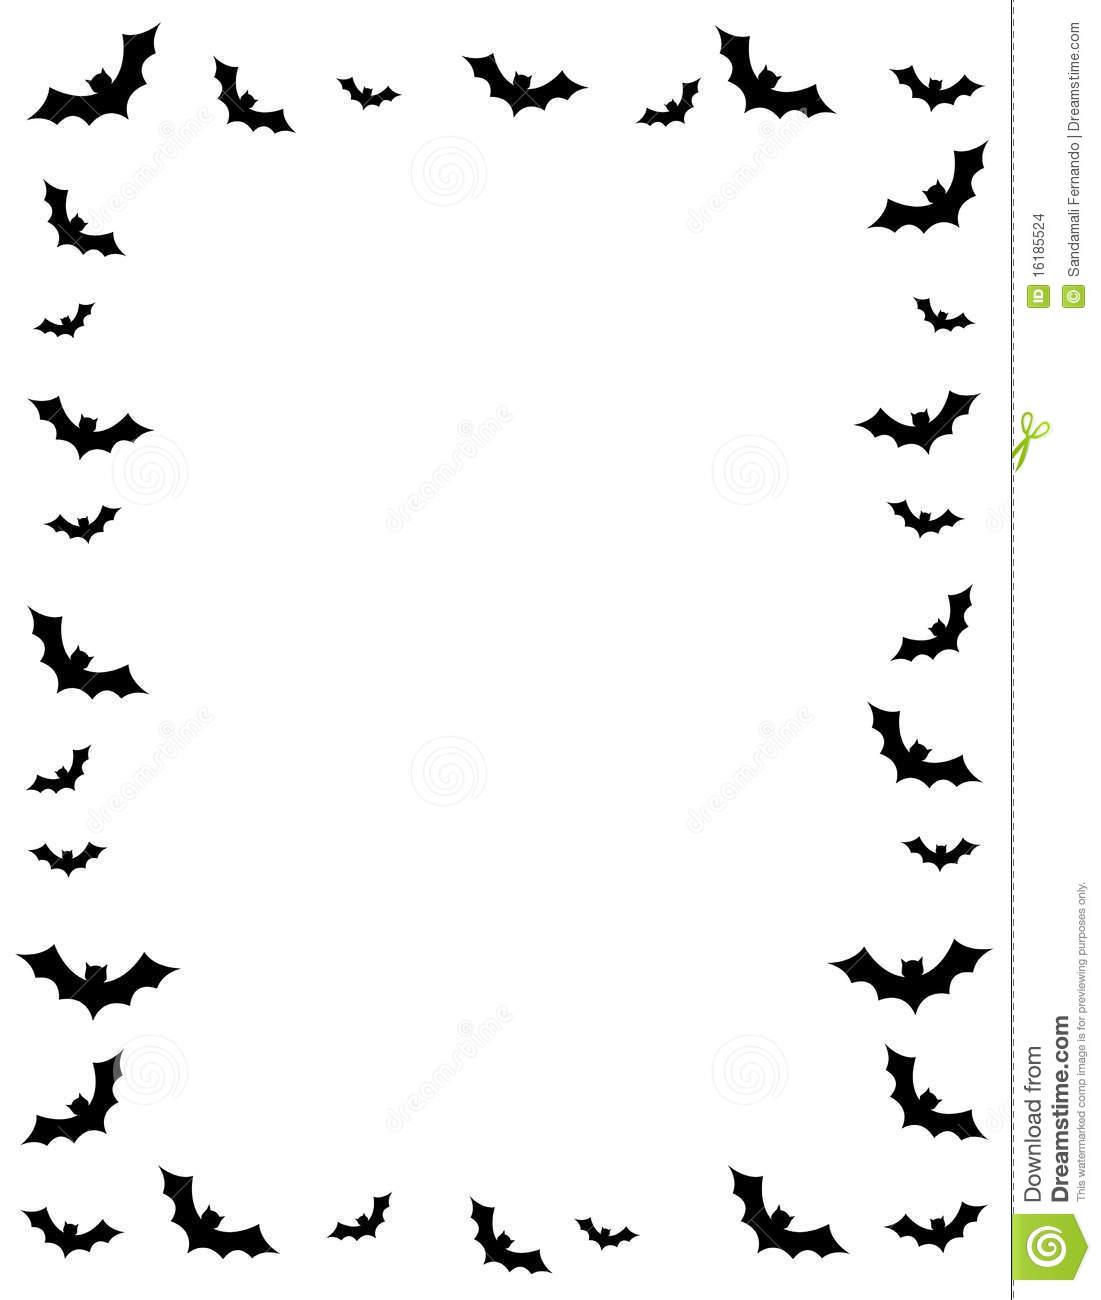 Free Halloween Borders Clipart